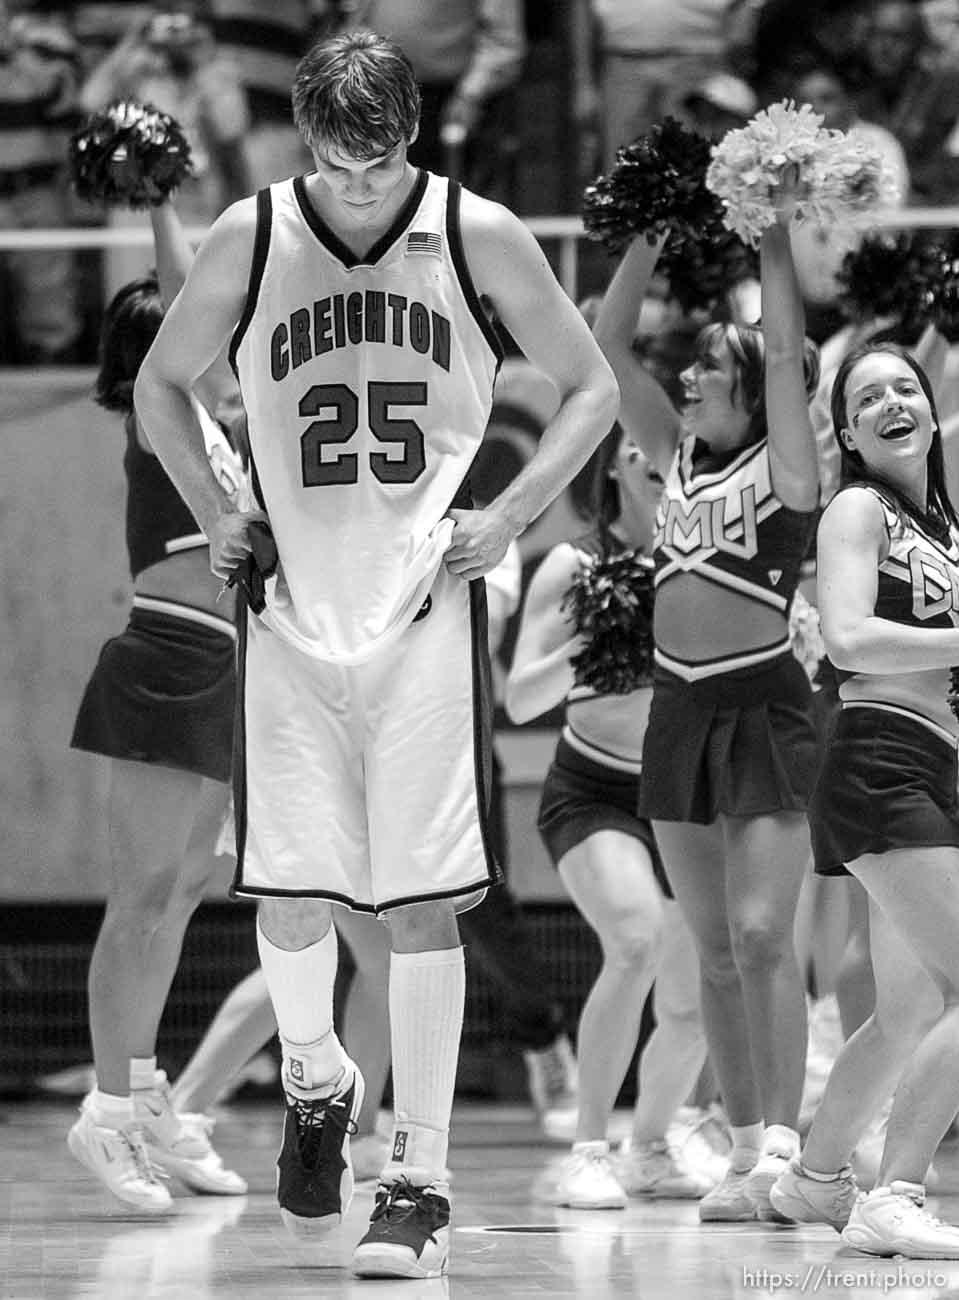 Creighton vs. Central Michigan, first round NCAA Tournament. ; 03.20.2003, 7:32:16 PM